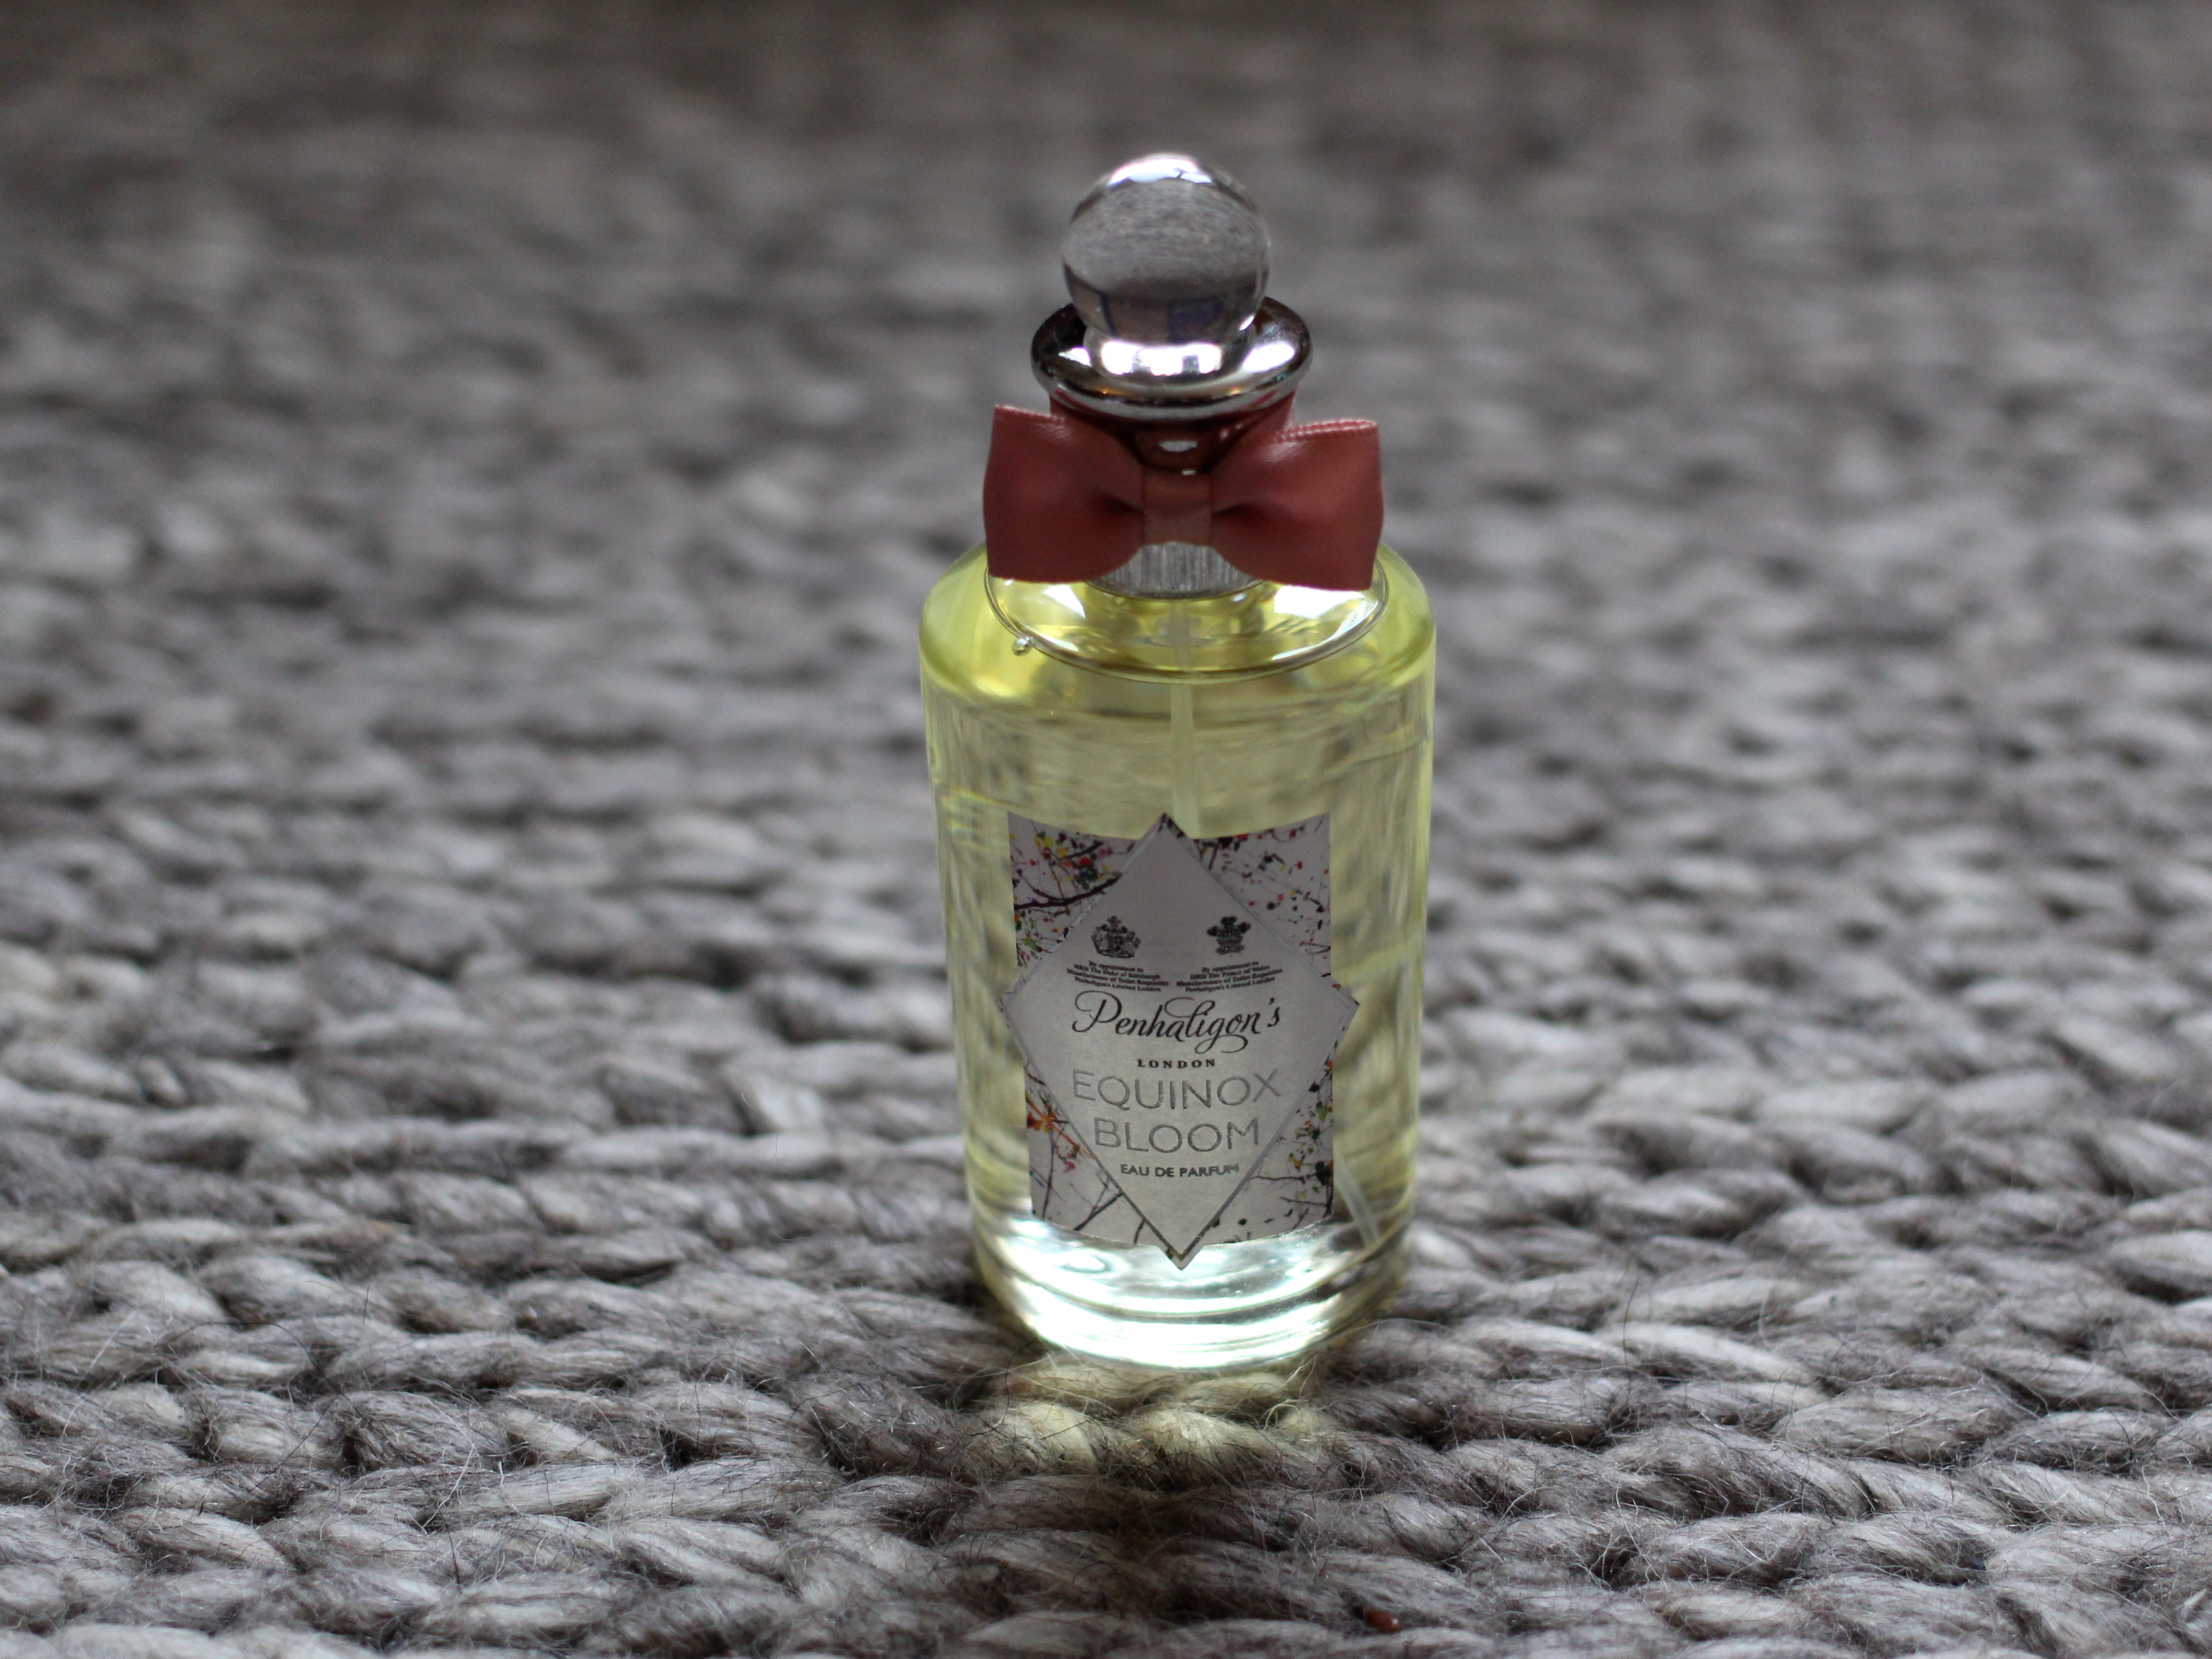 Penhaligon's Equinox Bloom Perfume Review